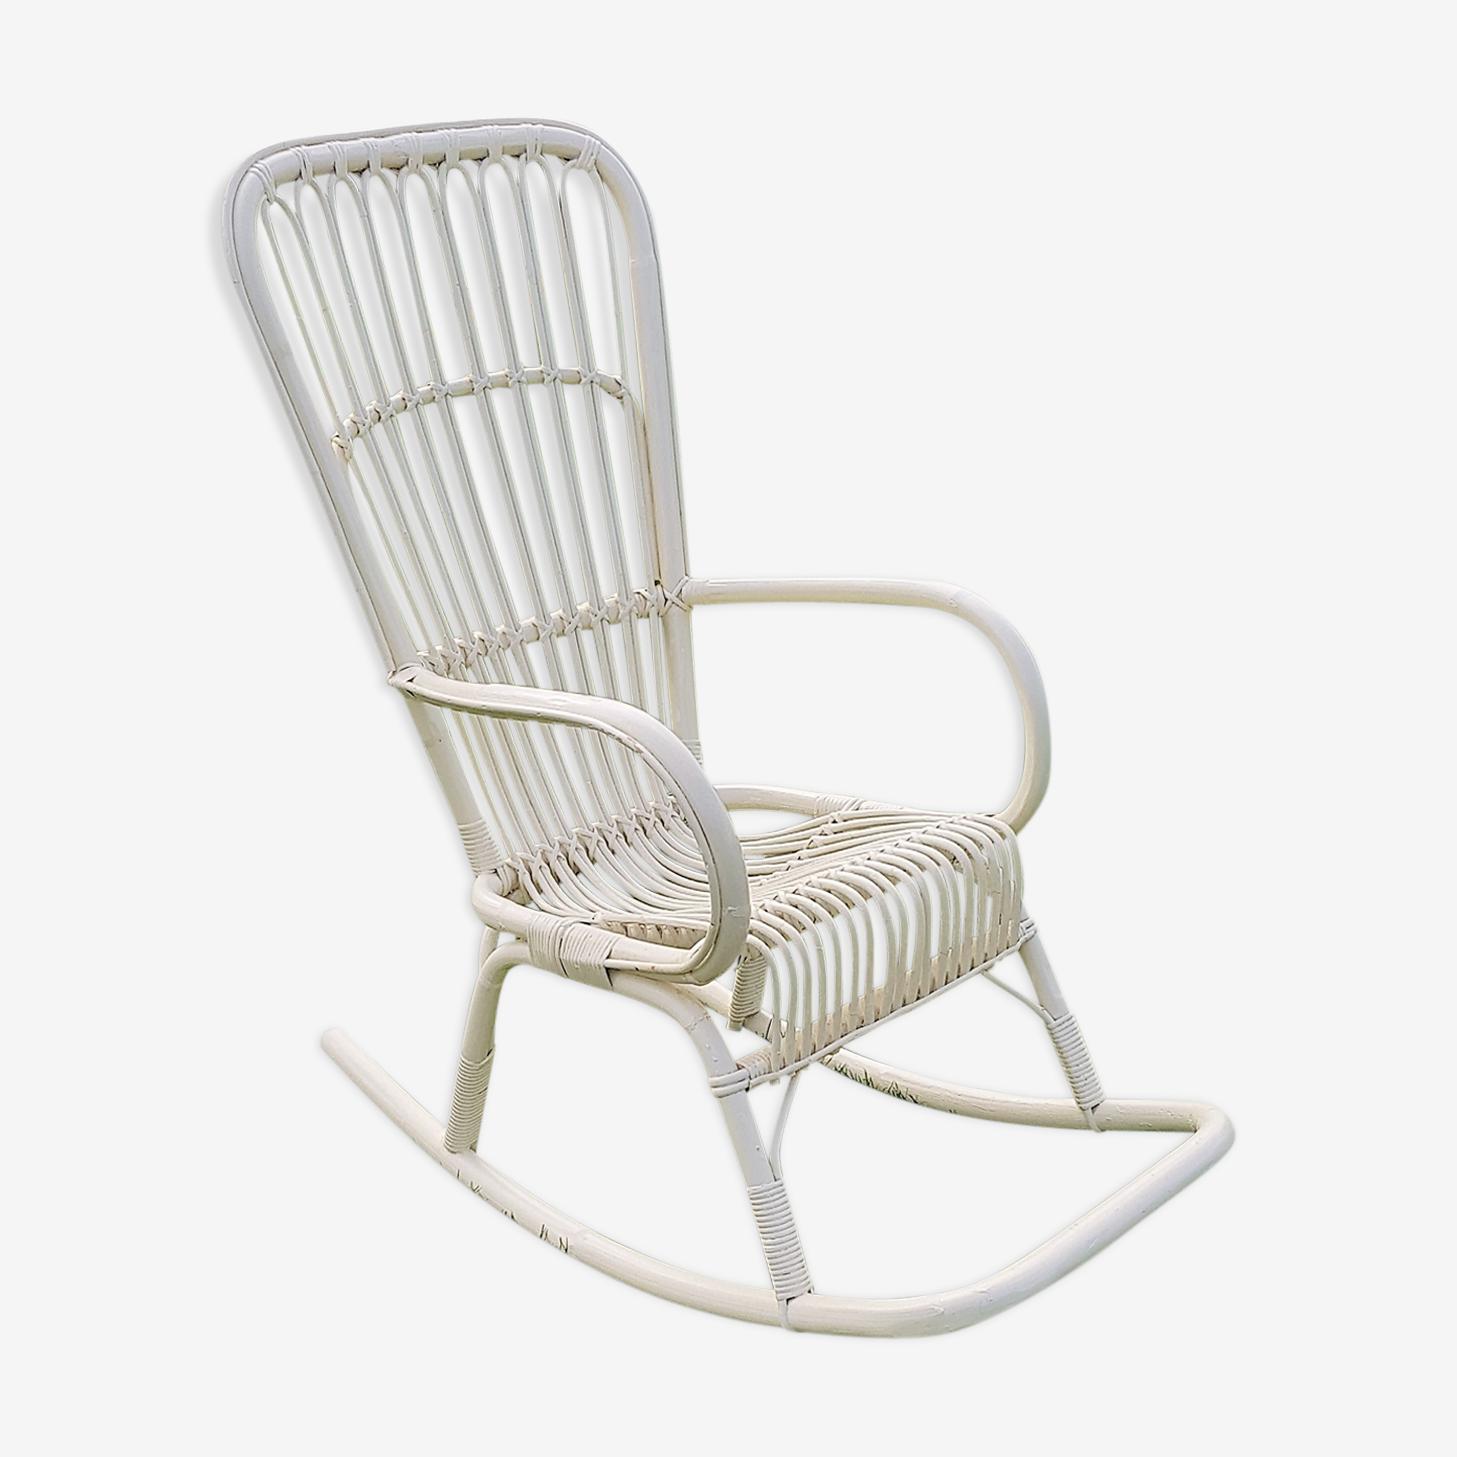 Vintage white rattan rocking chair